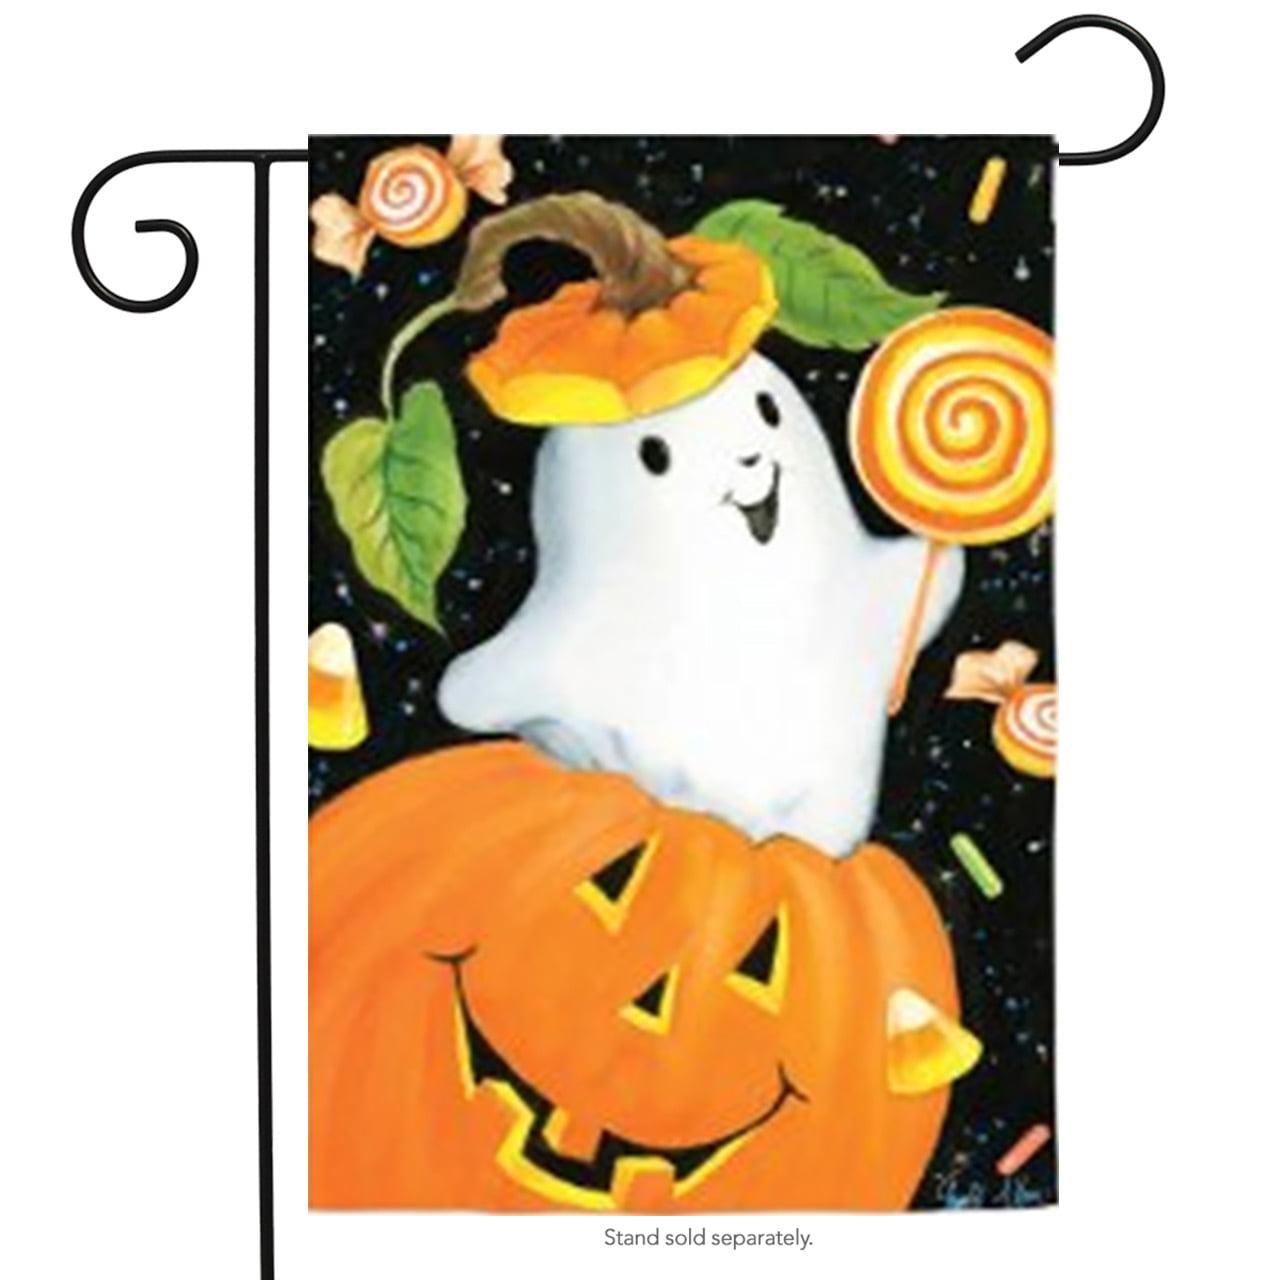 "Spooky Pumpkin Halloween Garden Flag Ghost Candy Lollipops 12.5"" x 18"